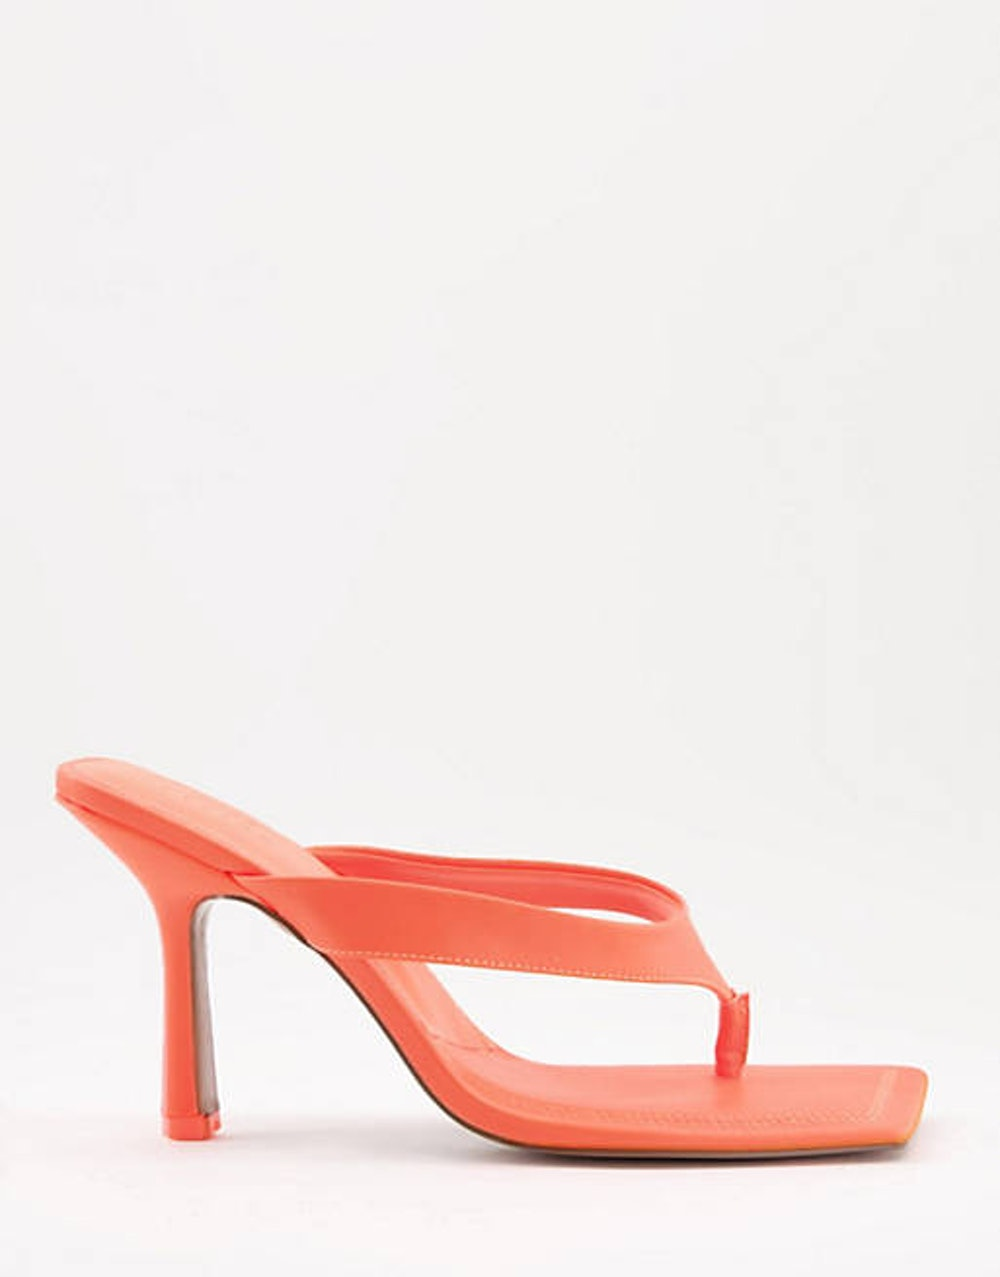 ASOS DESIGN Nissa toe thong heeled sandals in neon orange